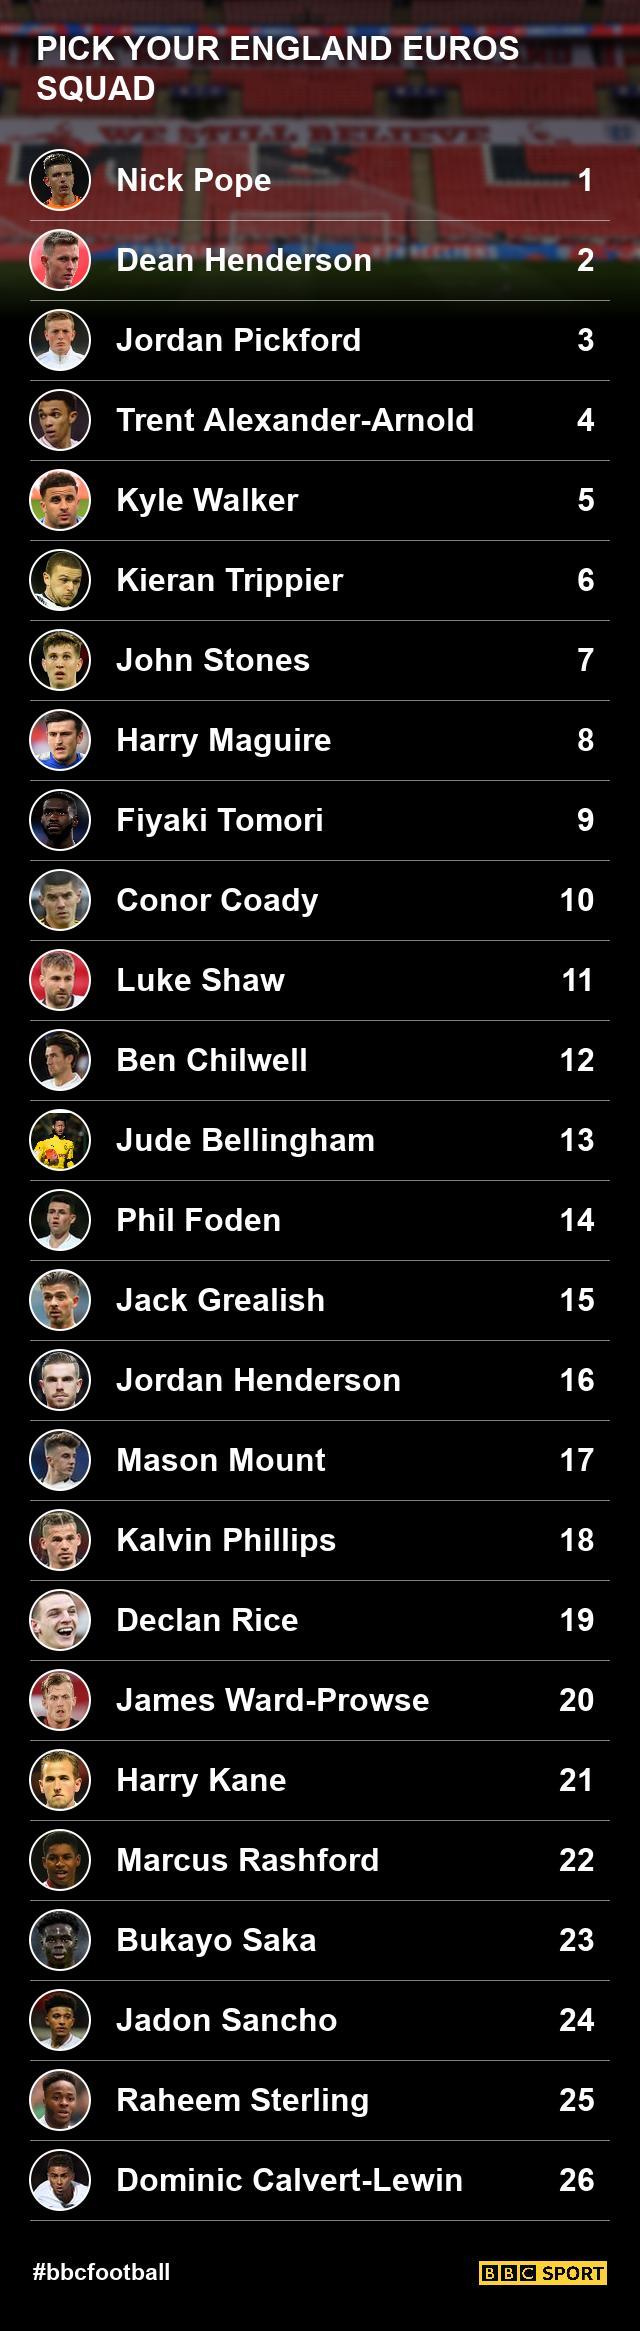 England-squad-selector-0678260c2f0bc9a83f7a40d6d62fc370.jpg